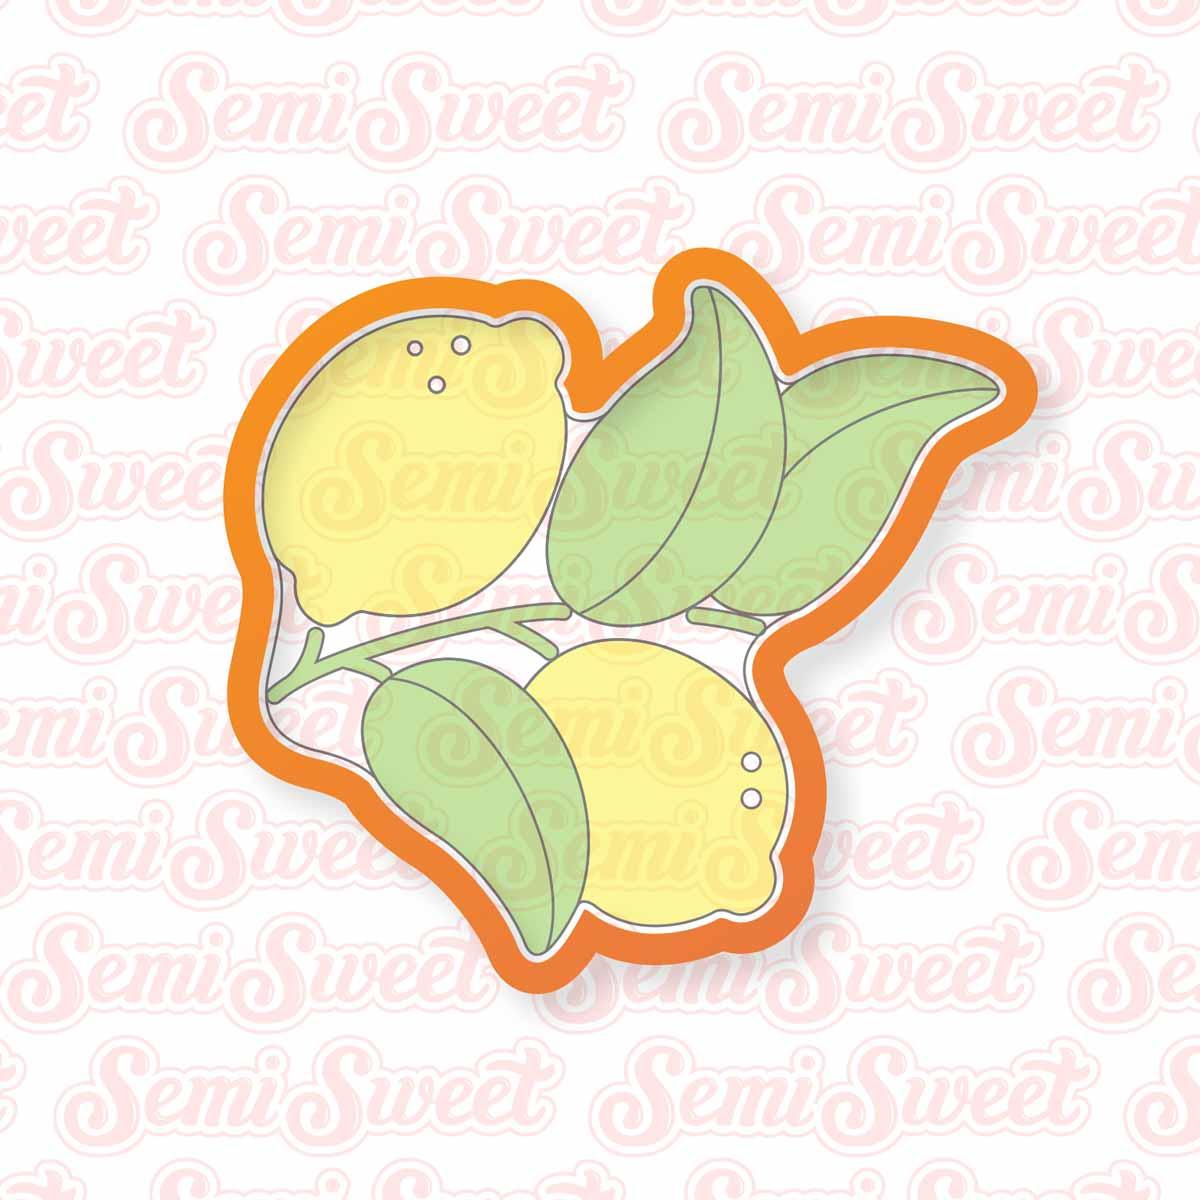 lemon wreath platter cookie cutter | Semi Sweet Designs